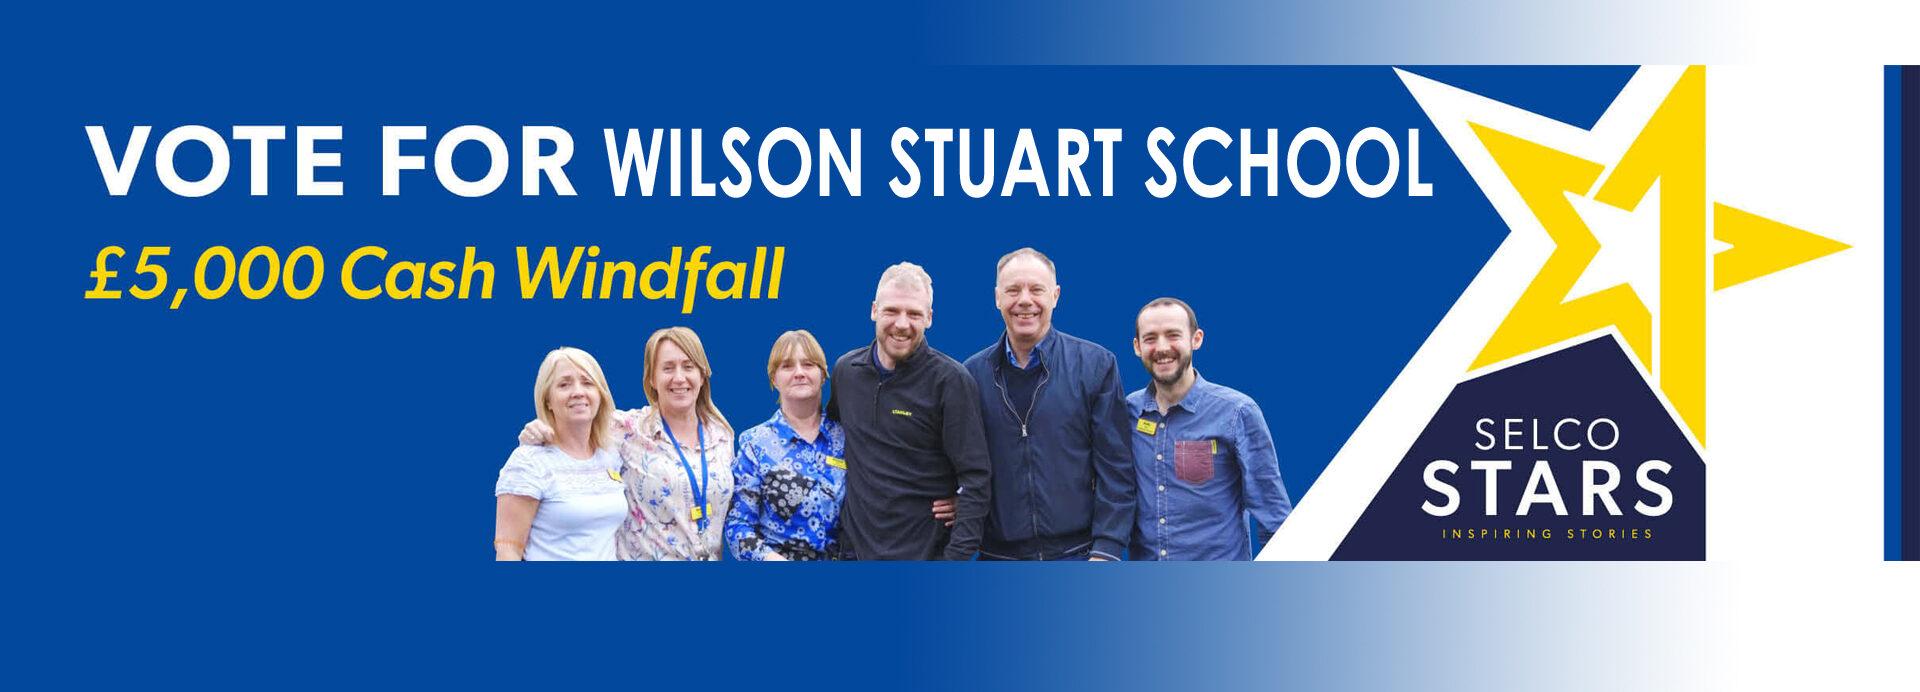 Selco Stars Vote for Wilson Stuart School